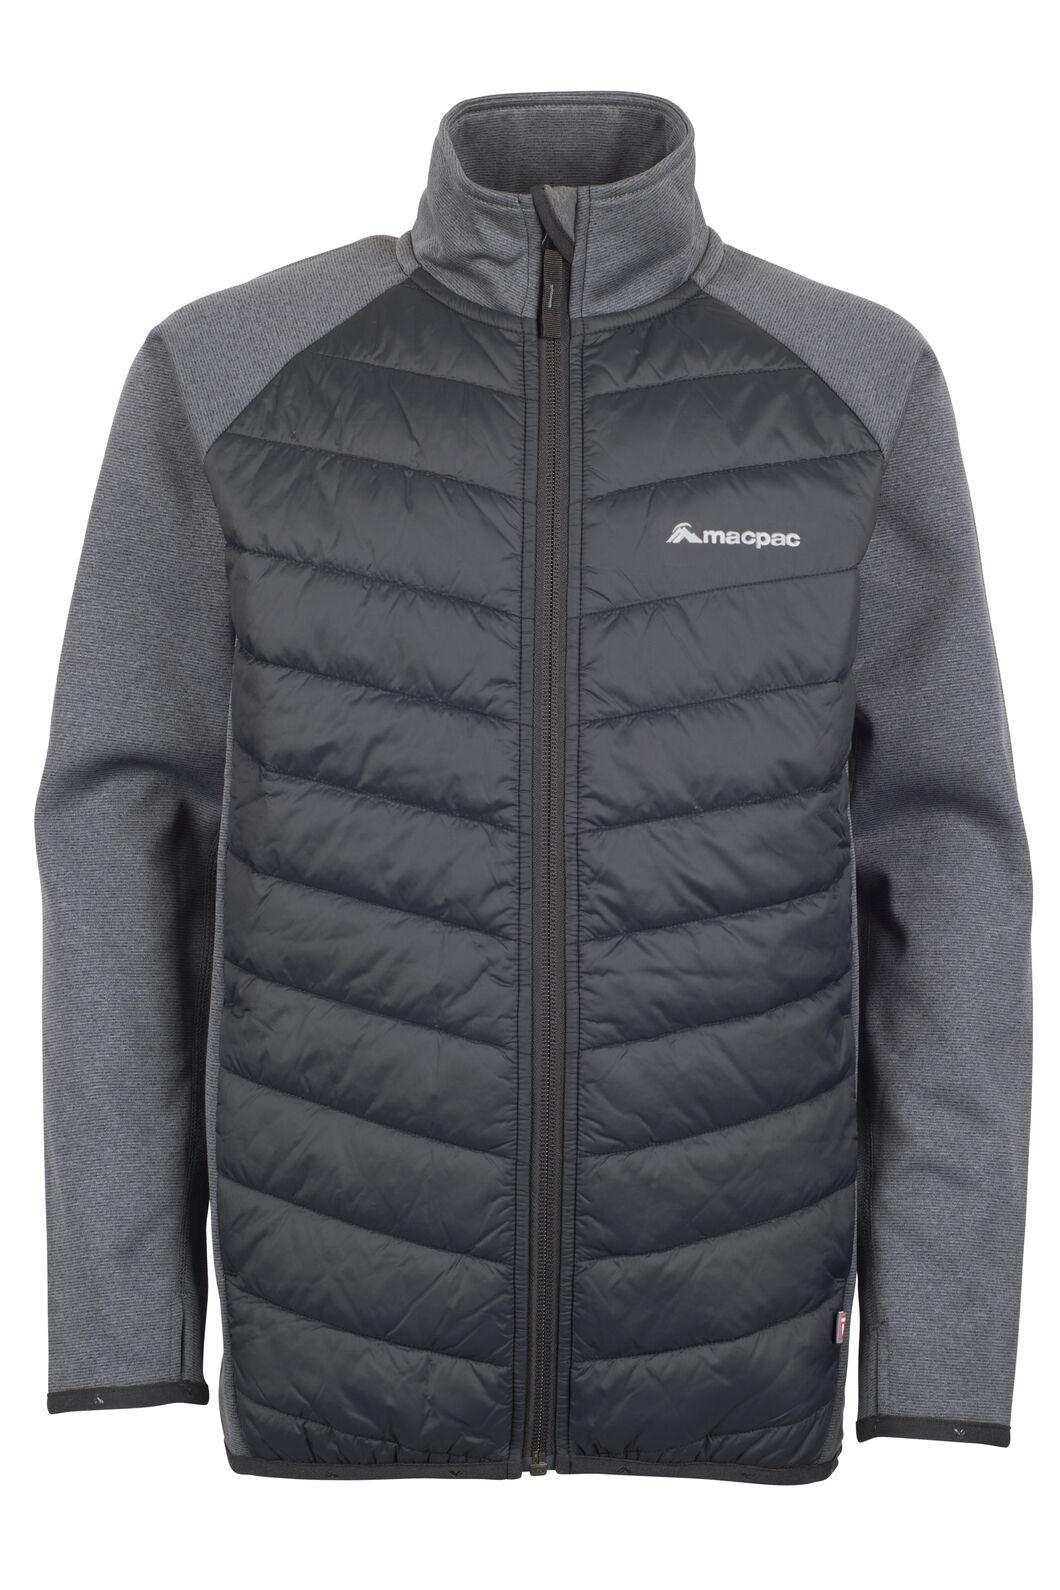 Kiwi Hybrid Jacket - Kids', Black/Asphalt, hi-res